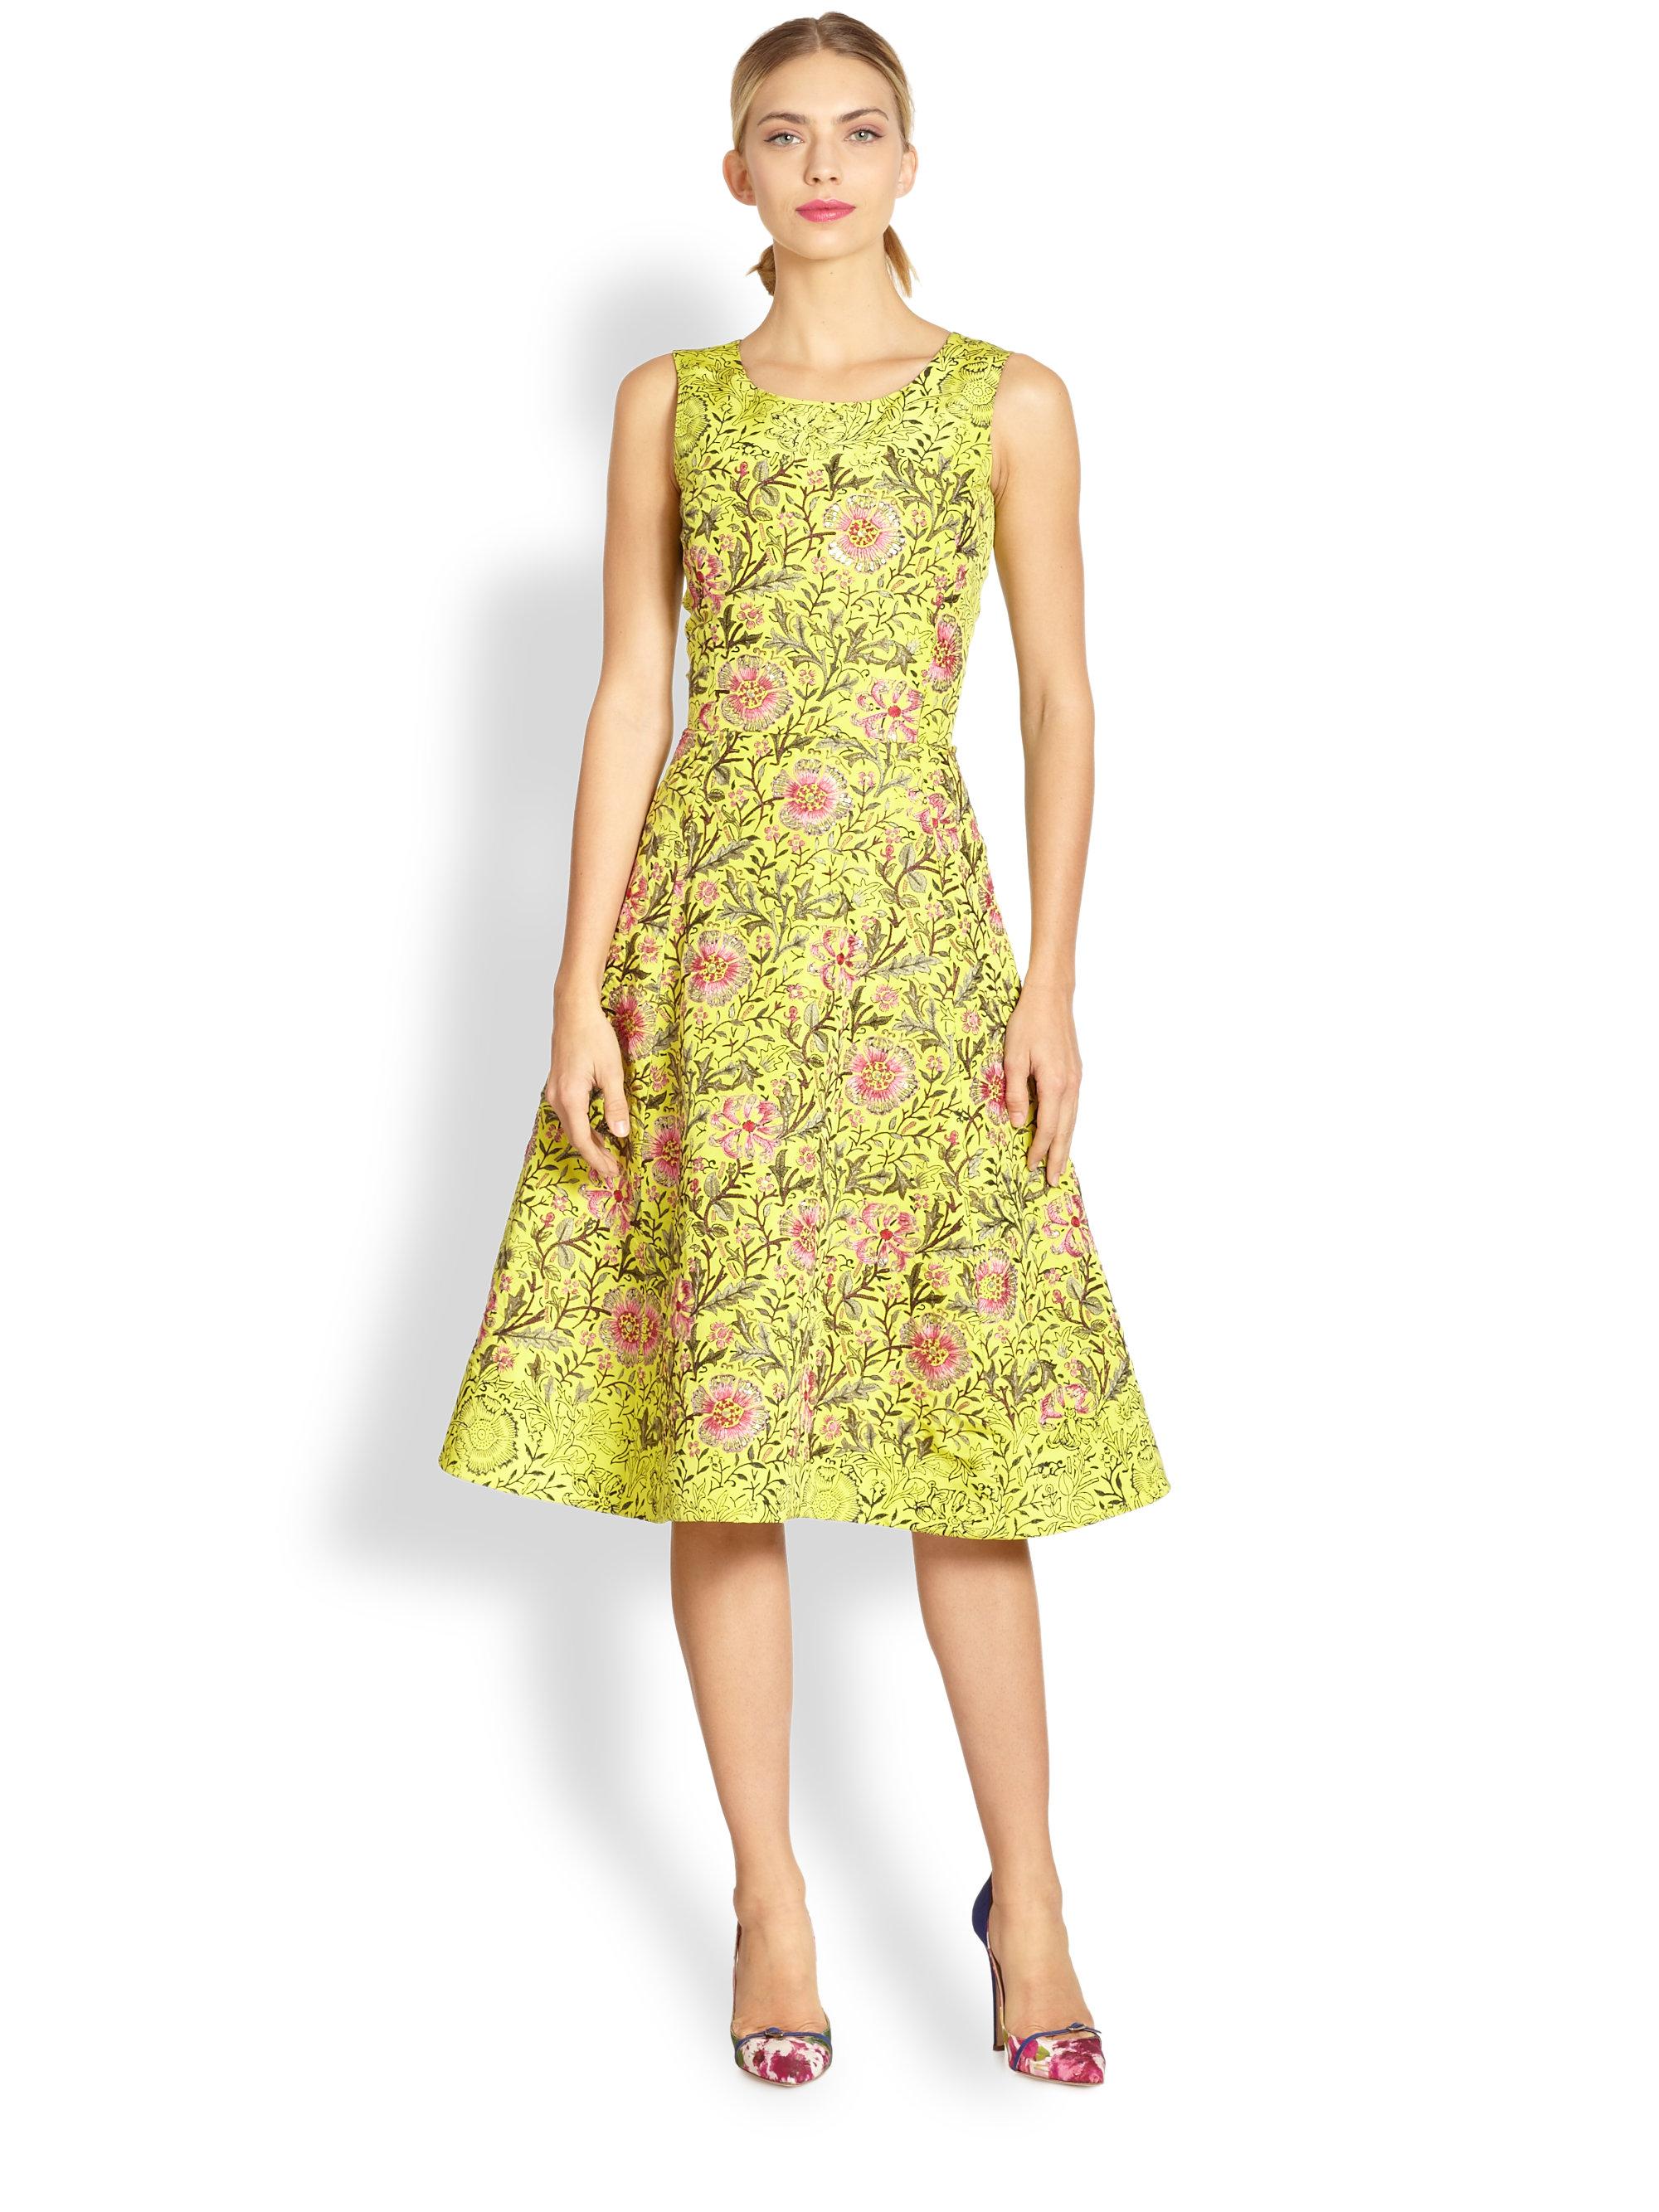 Lyst oscar de la renta silk floral embroidery dress in